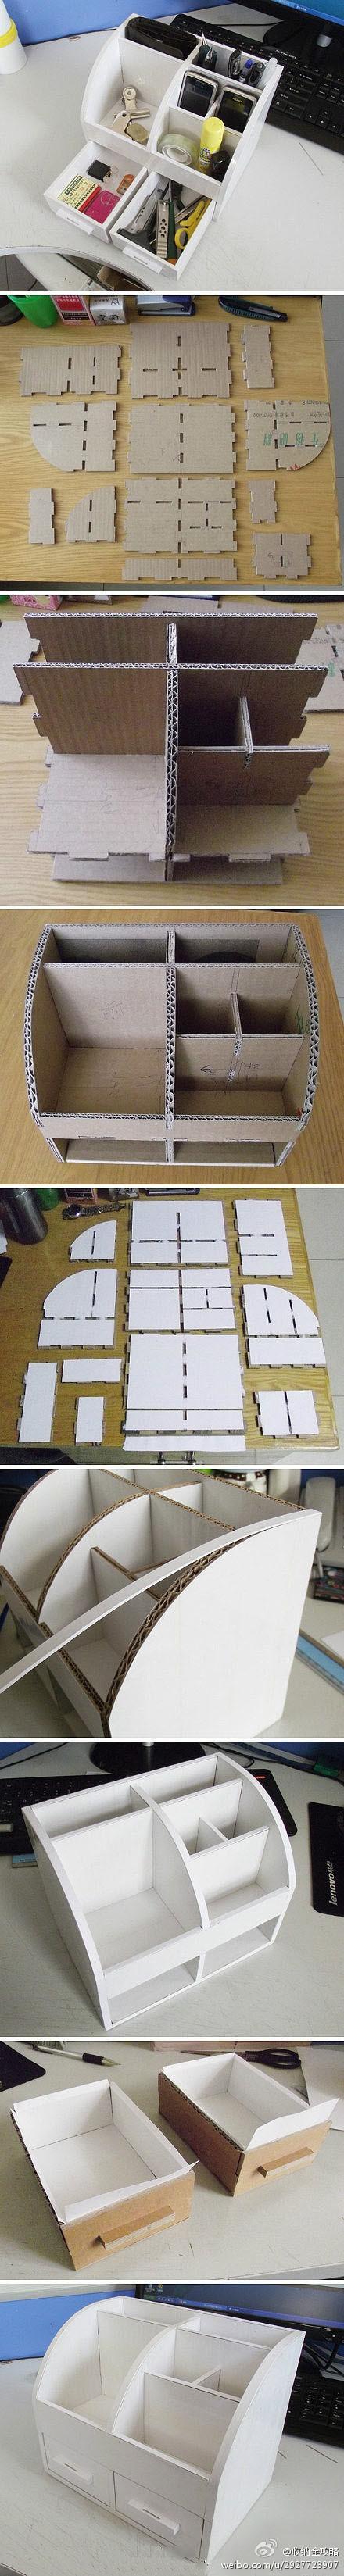 Storage Box with Drawer   Materials: Corrugated Cardboard   Instructions: http://tieba.baidu.com/p/2927723907